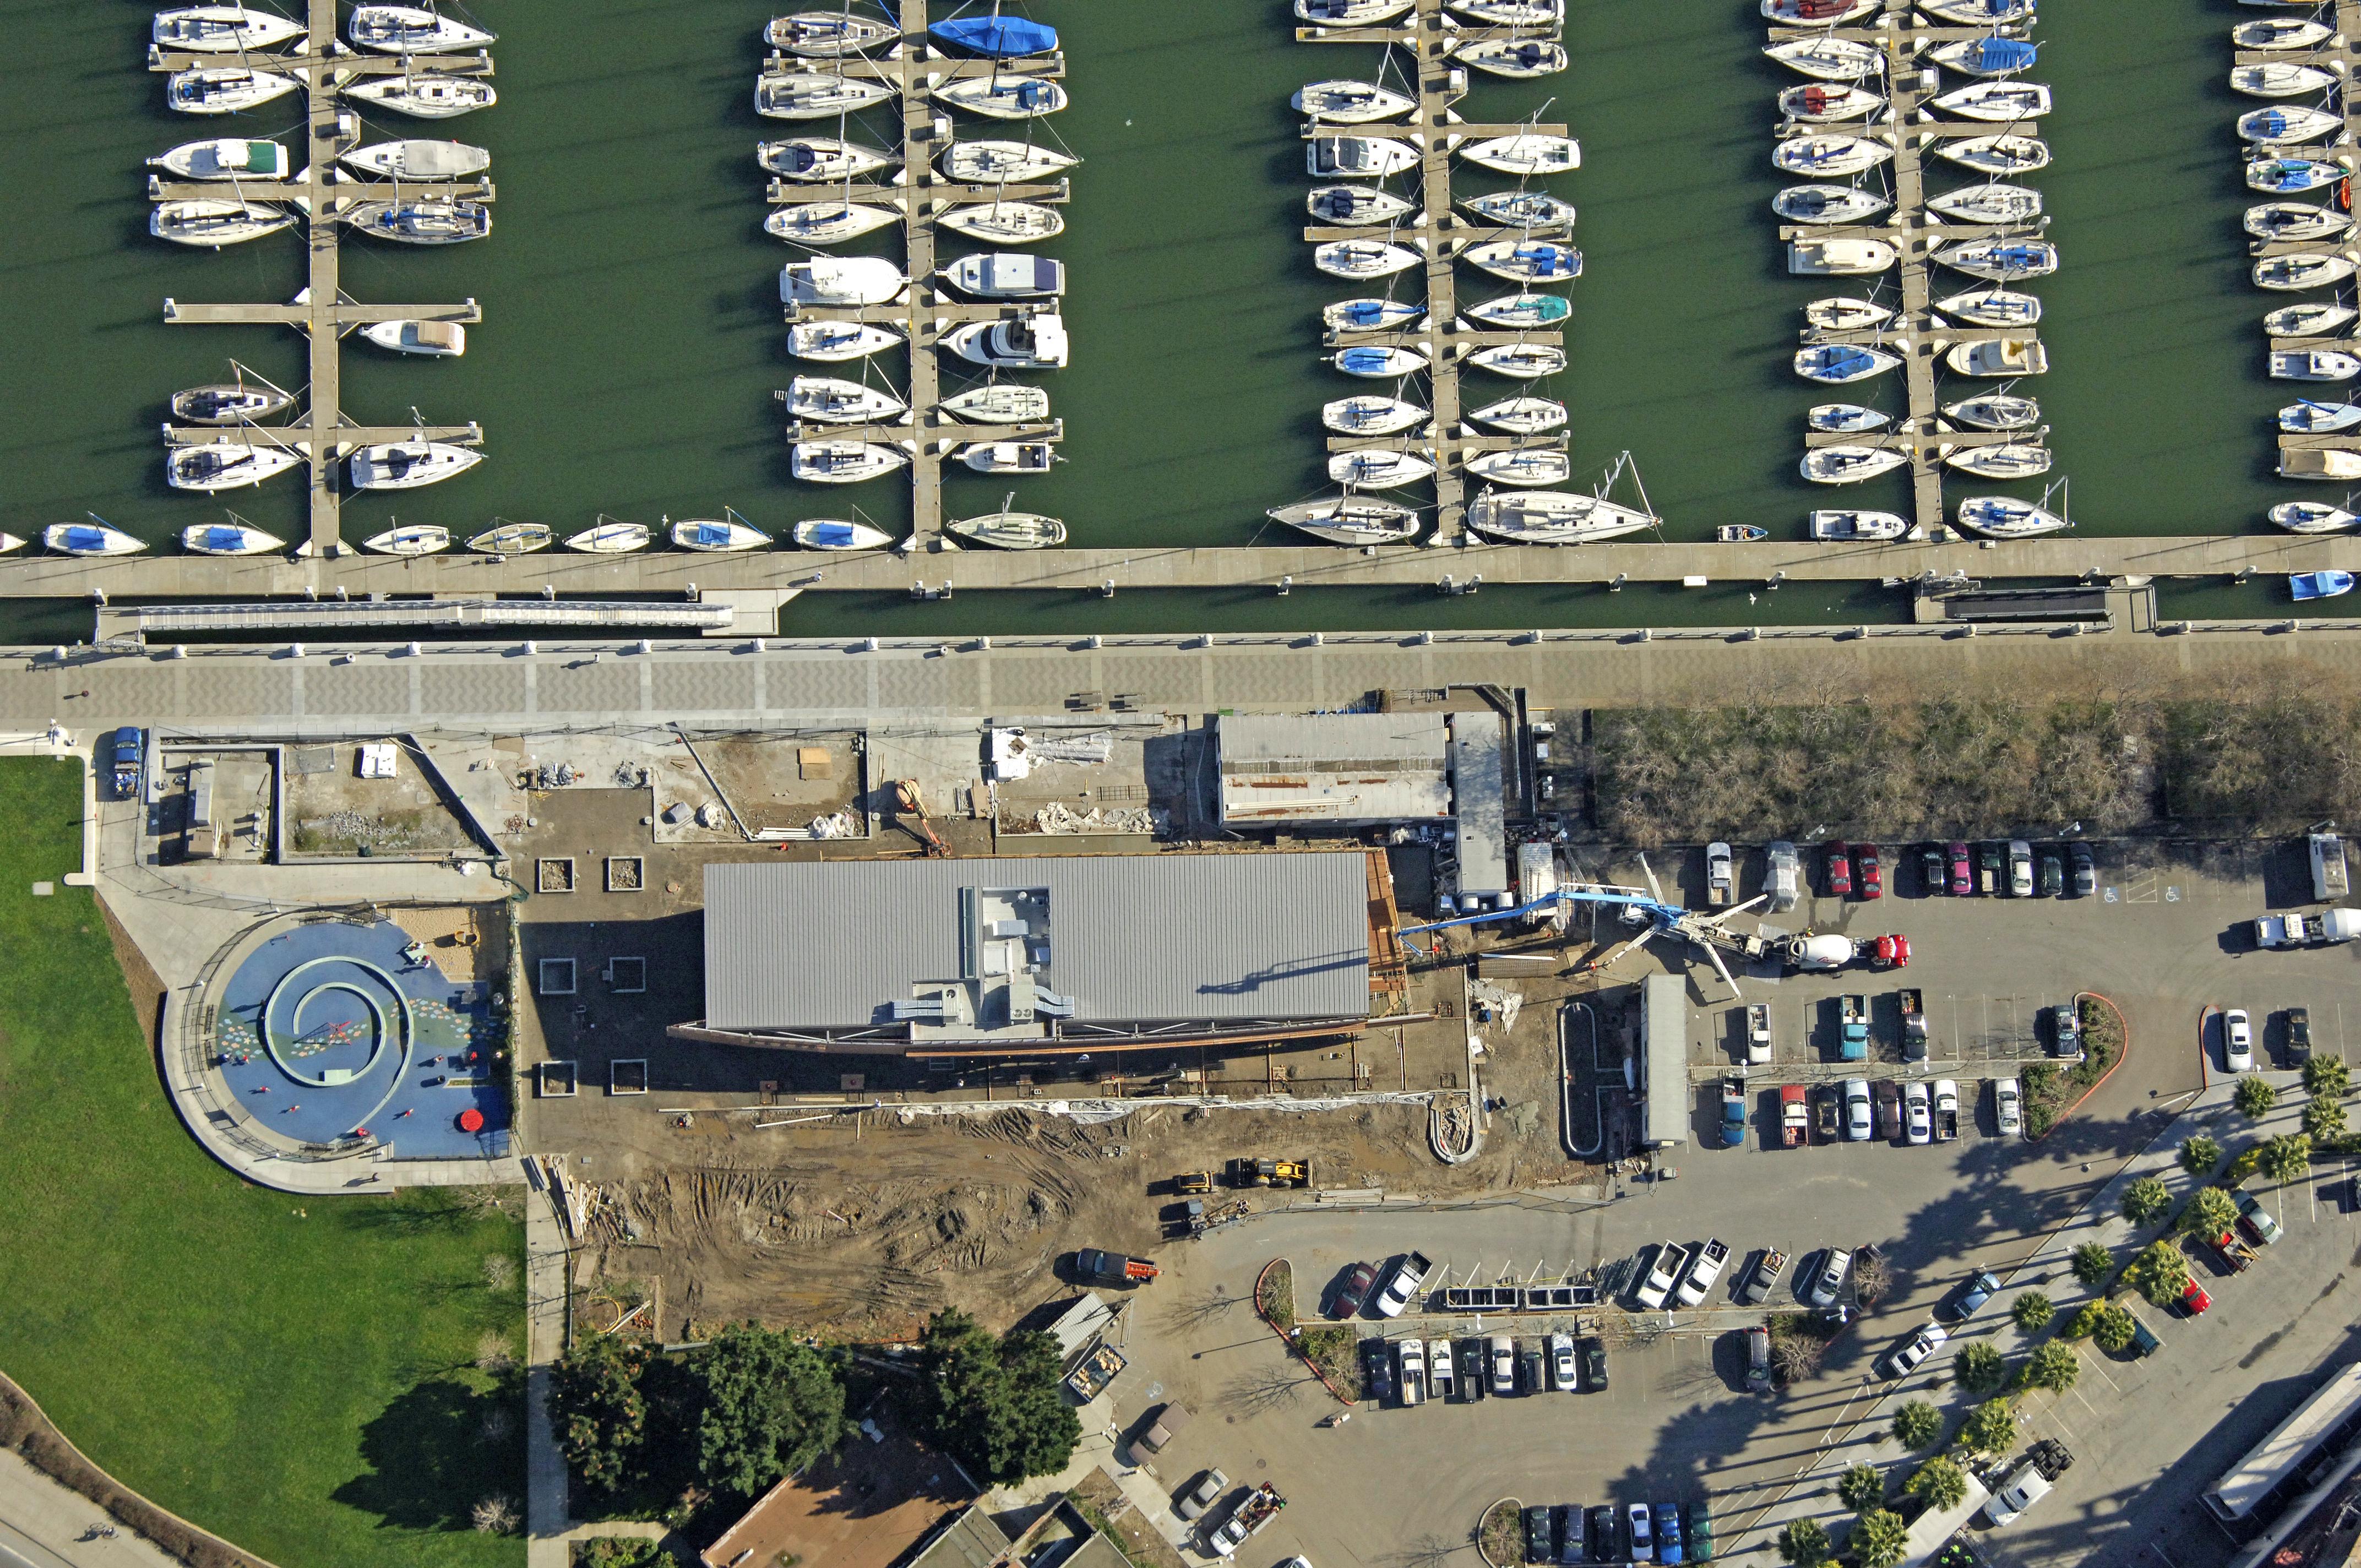 South Beach Yacht Club in San Francisco, CA, United States - Marina